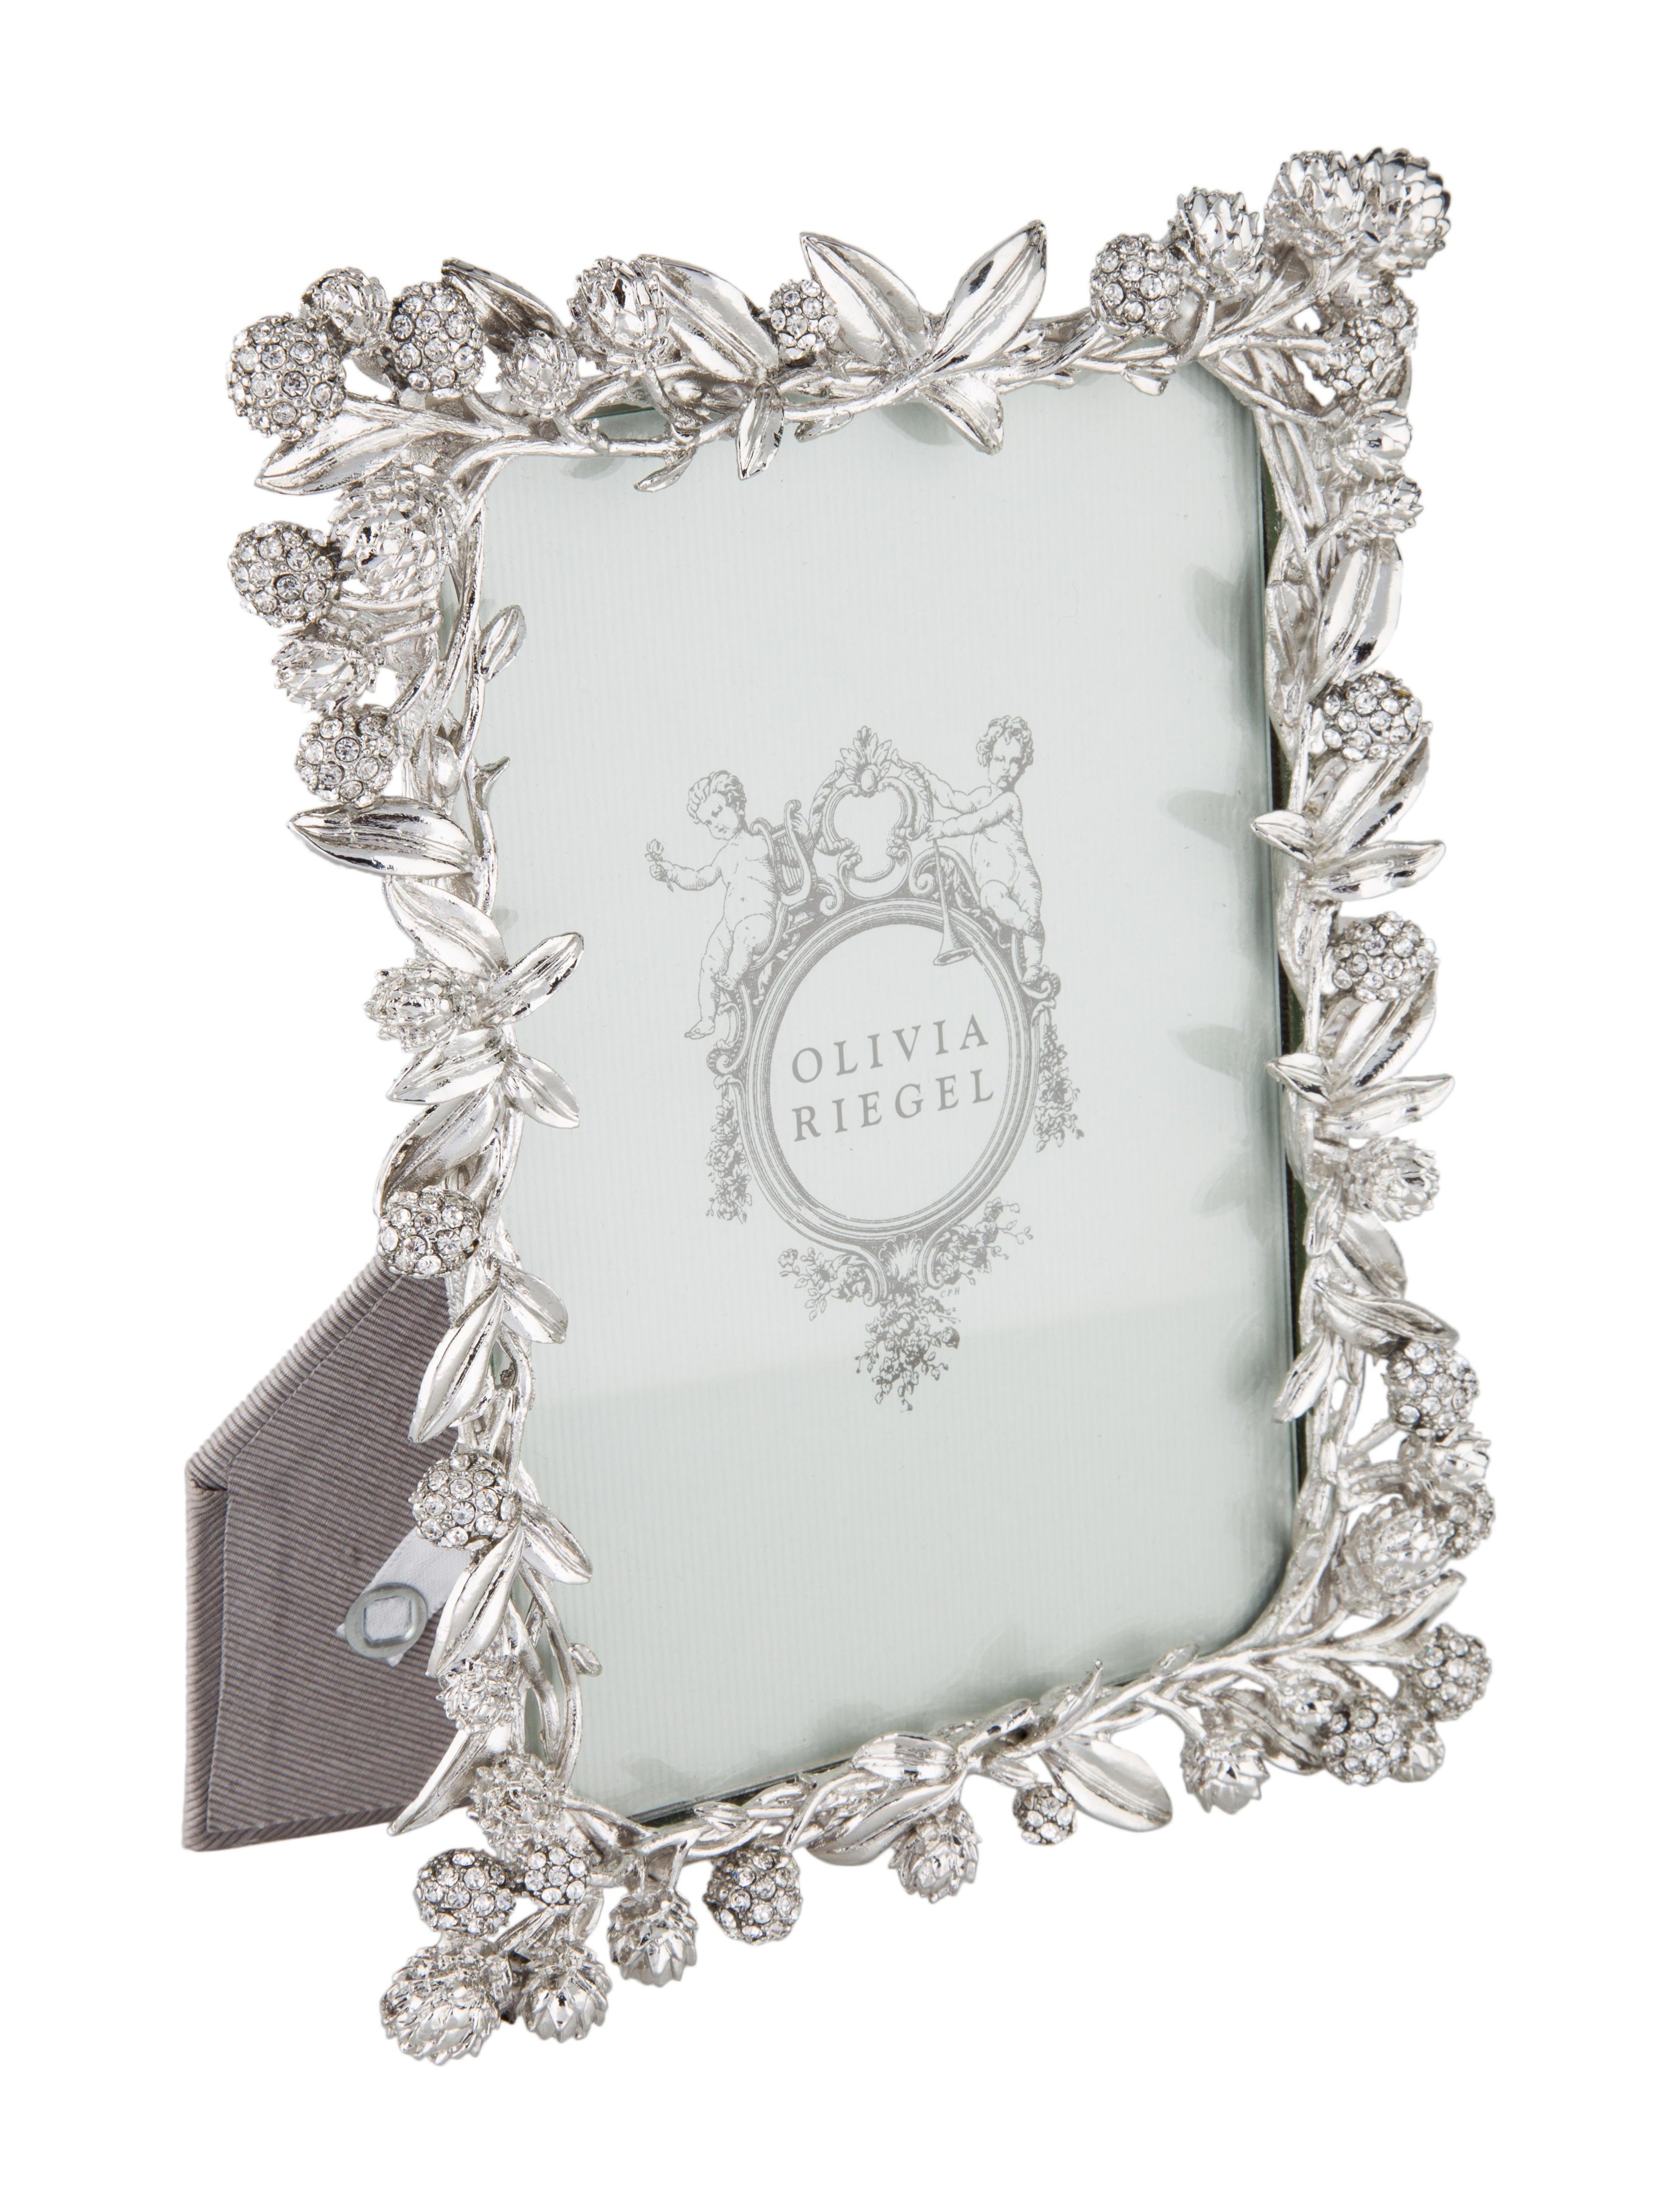 Olivia Riegel Cornelia Frame - Decor And Accessories - FRAME20111 ...